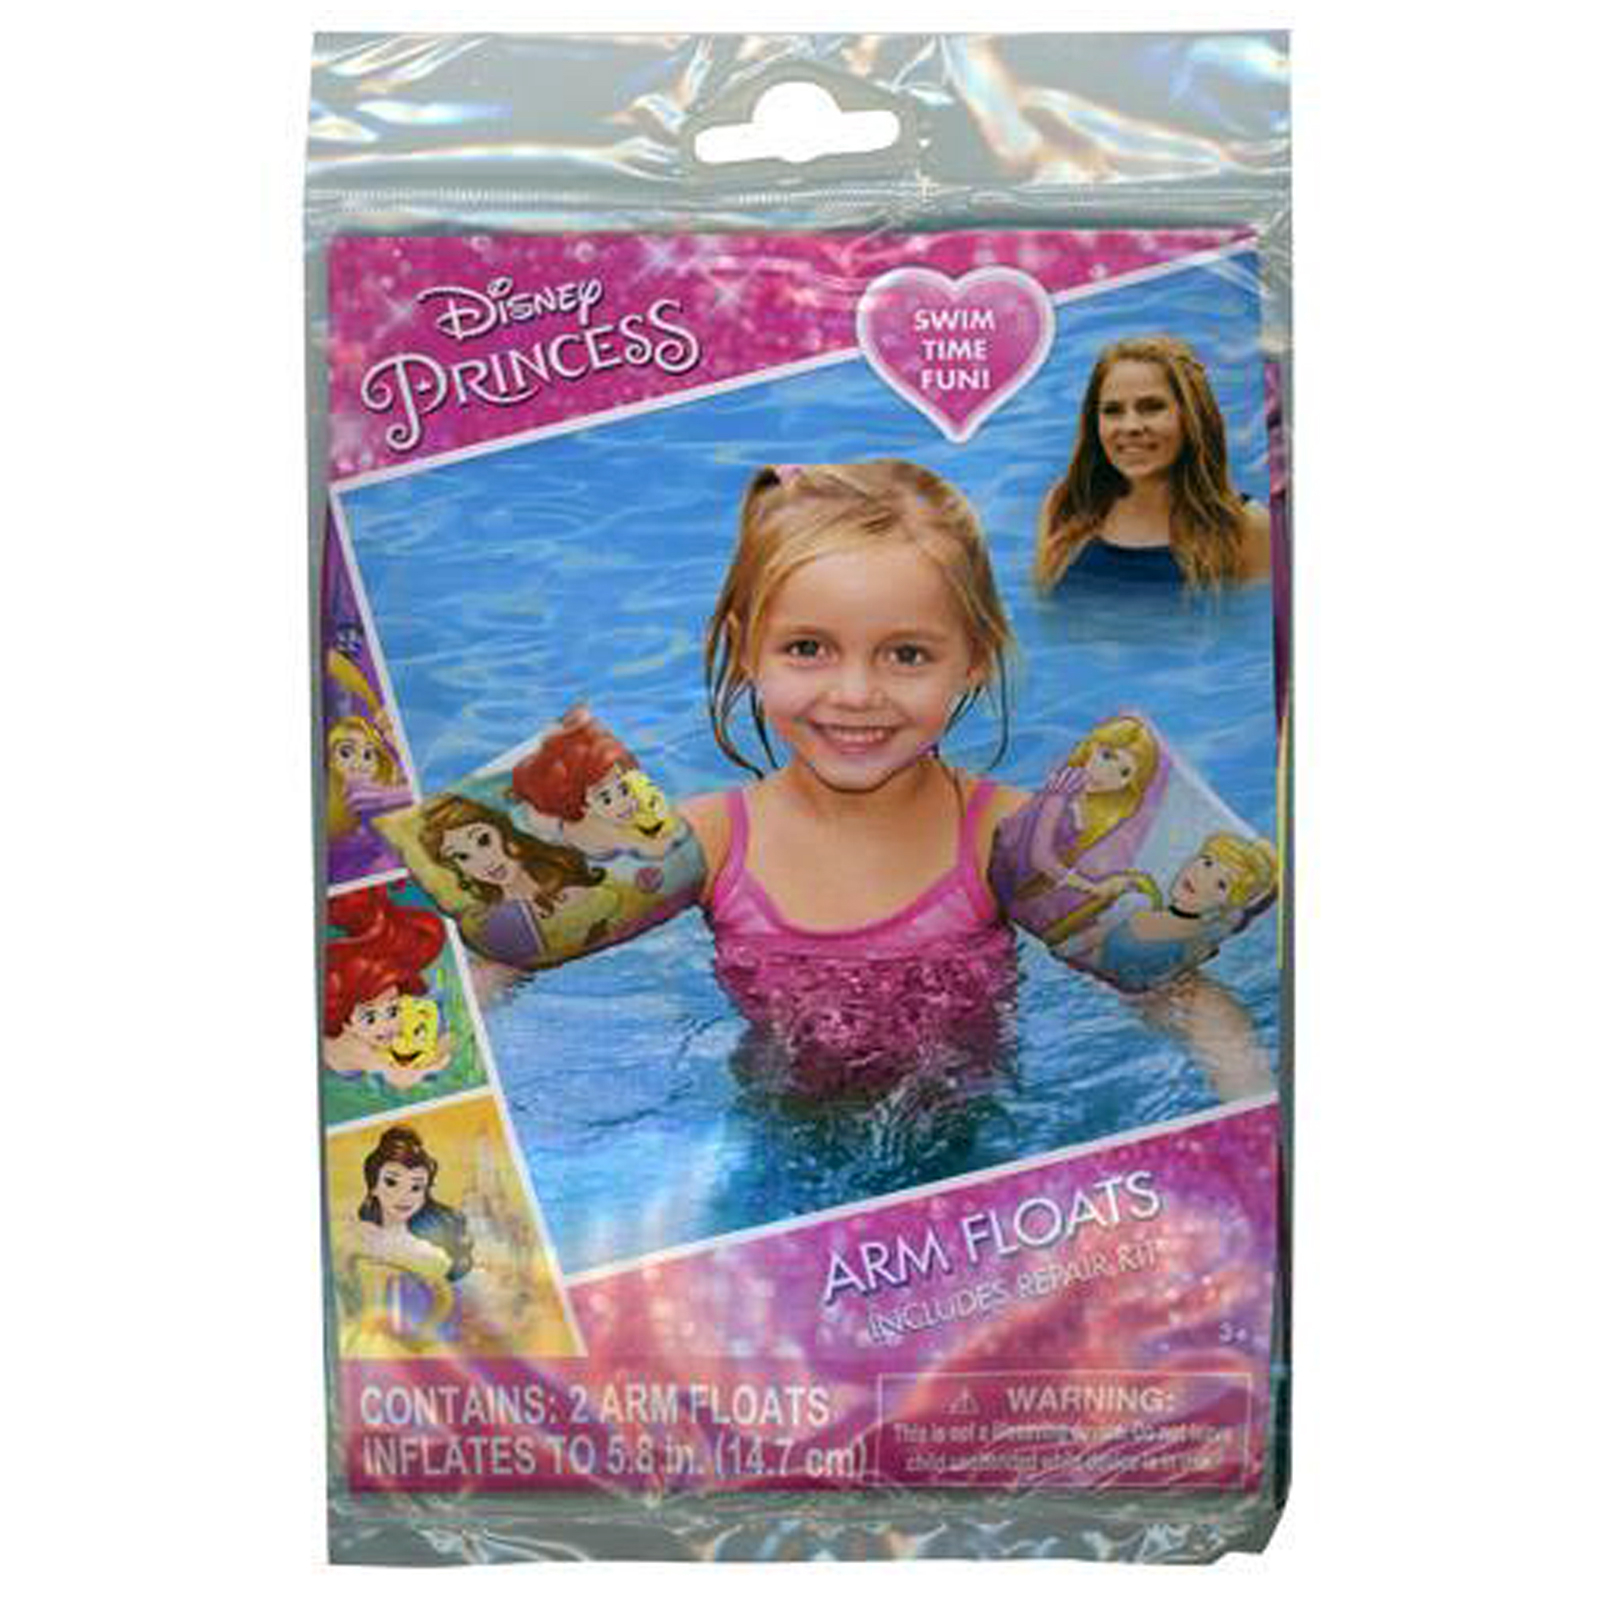 Disney Princess Inflatable Arm Floaties Girls Summer Pool Floats with Repair Kit